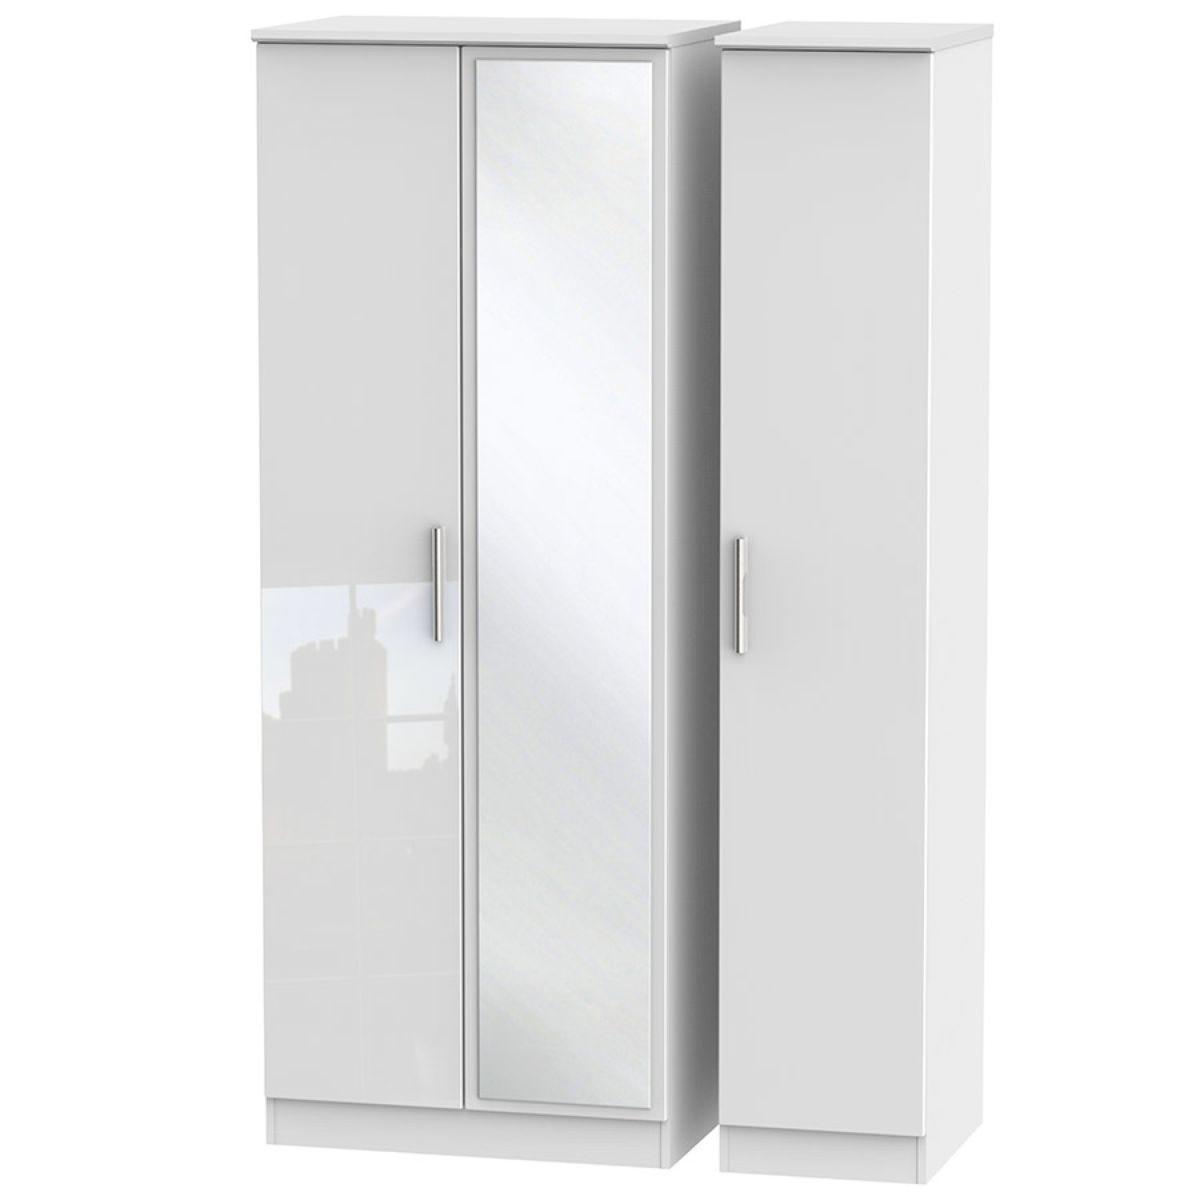 Fourisse Tall 3-Door Mirrored Wardrobe -White